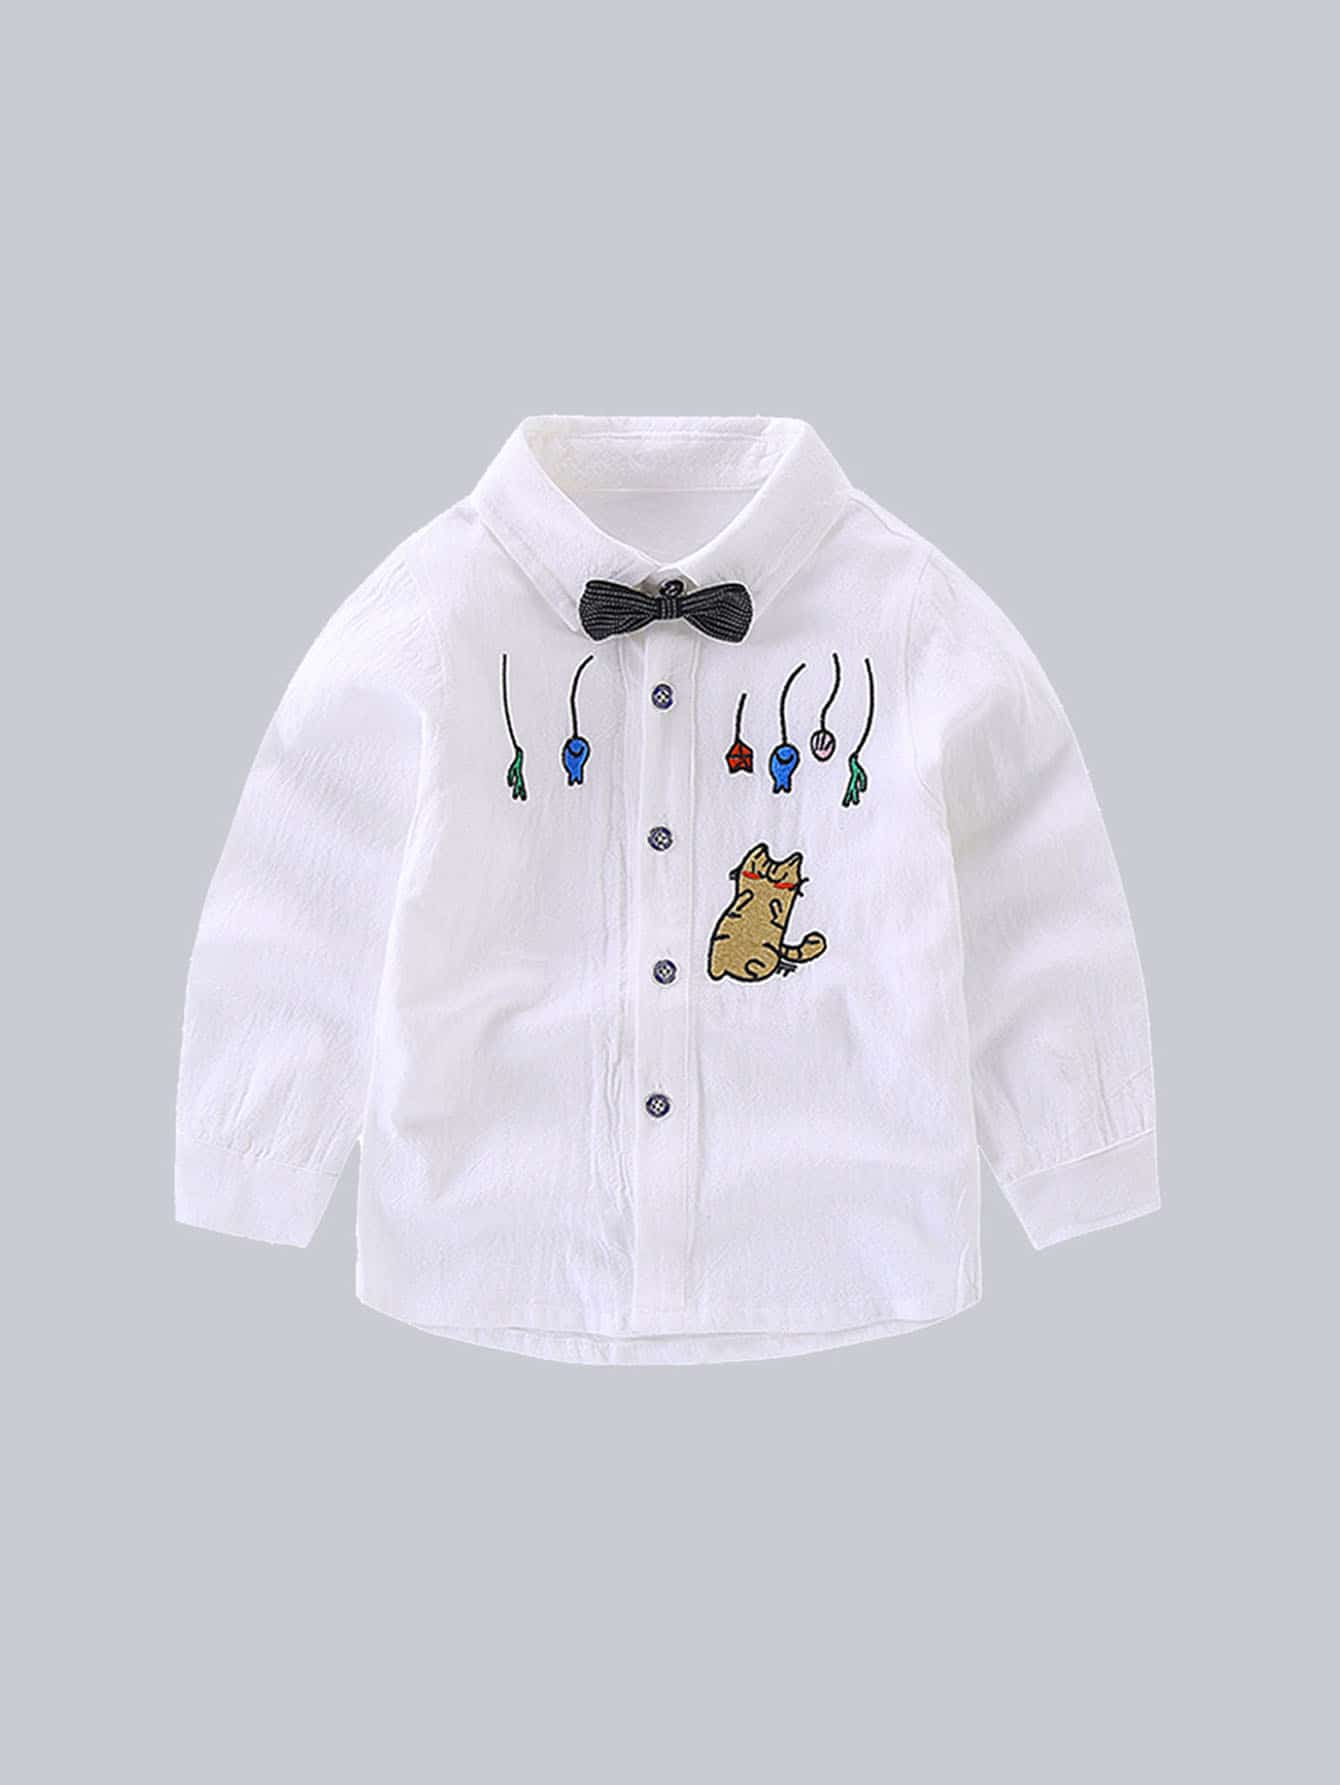 Kids Tie Neck Cartoon Print Blouse kids tie neck gingham blouse